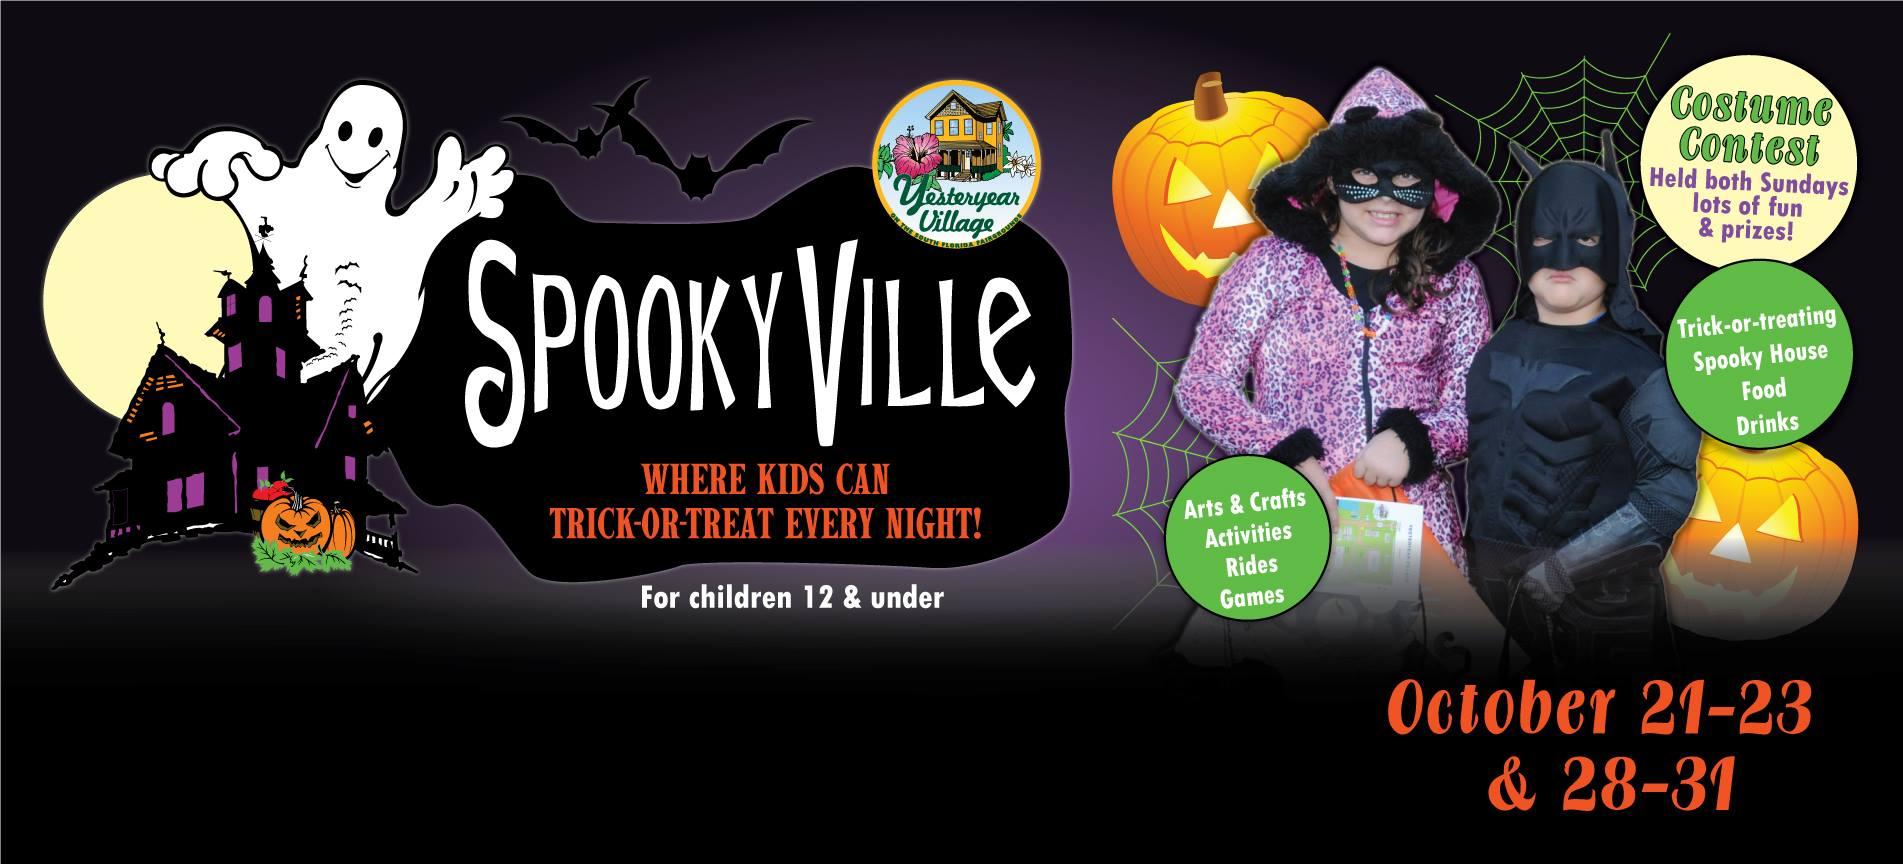 spookyville.jpg